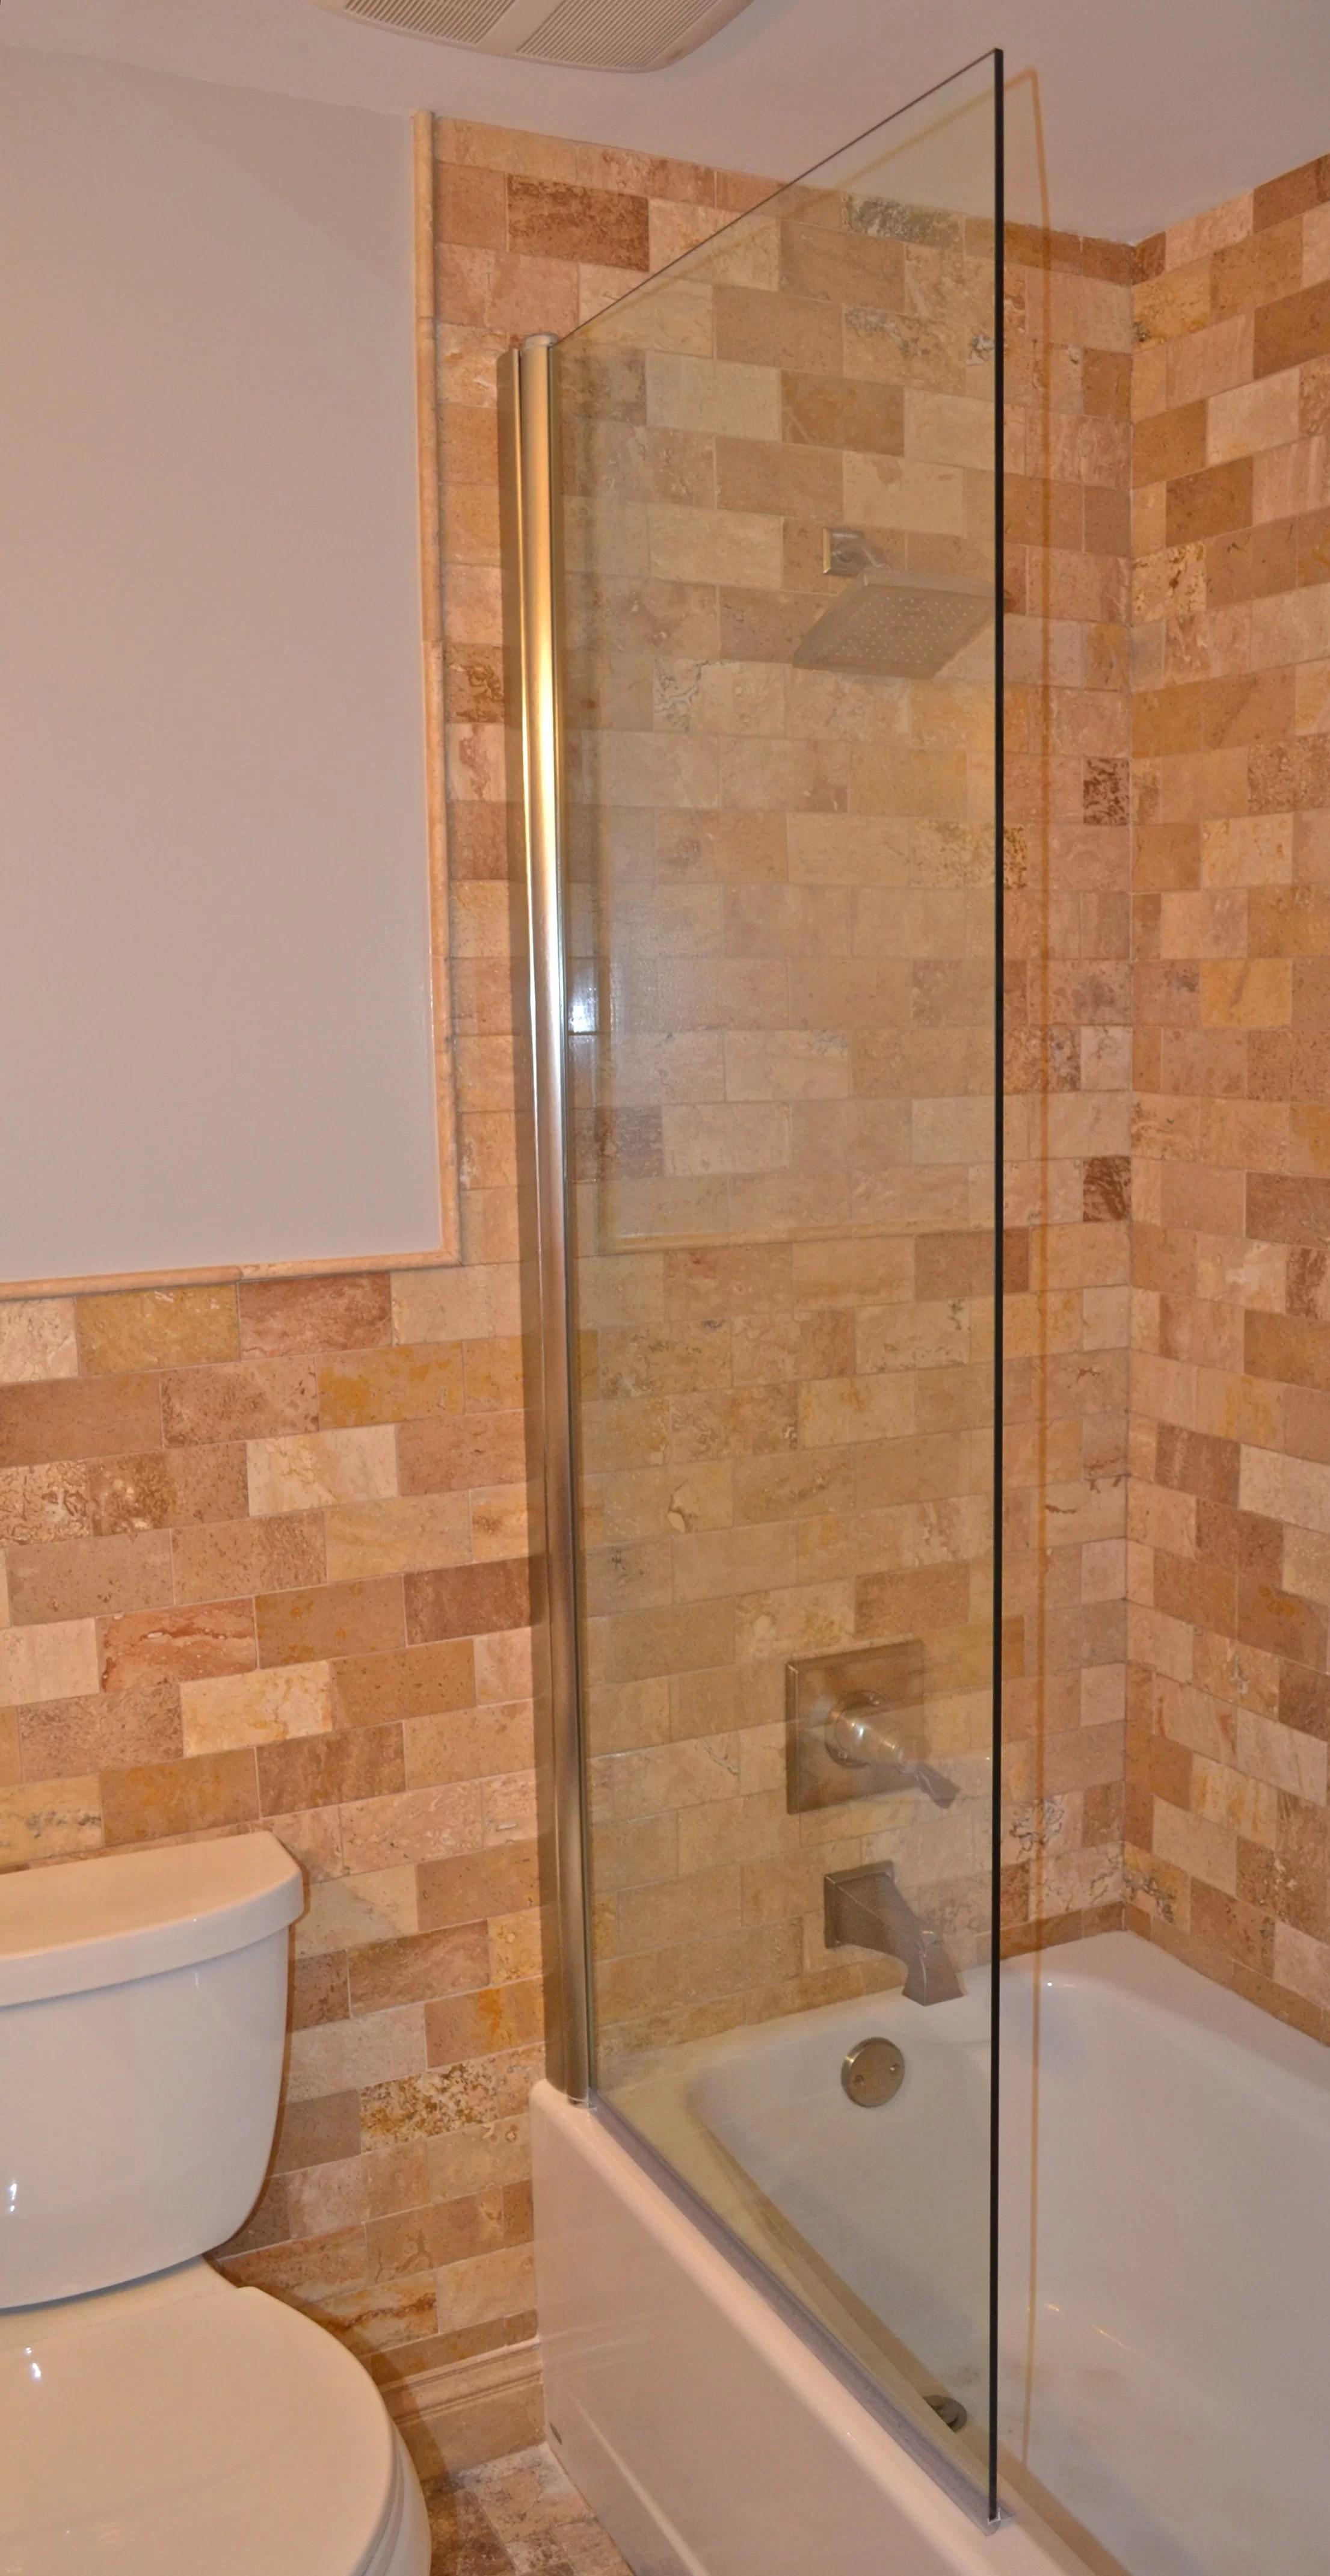 30 X 70 Pivot Semi Frameless Tub Door